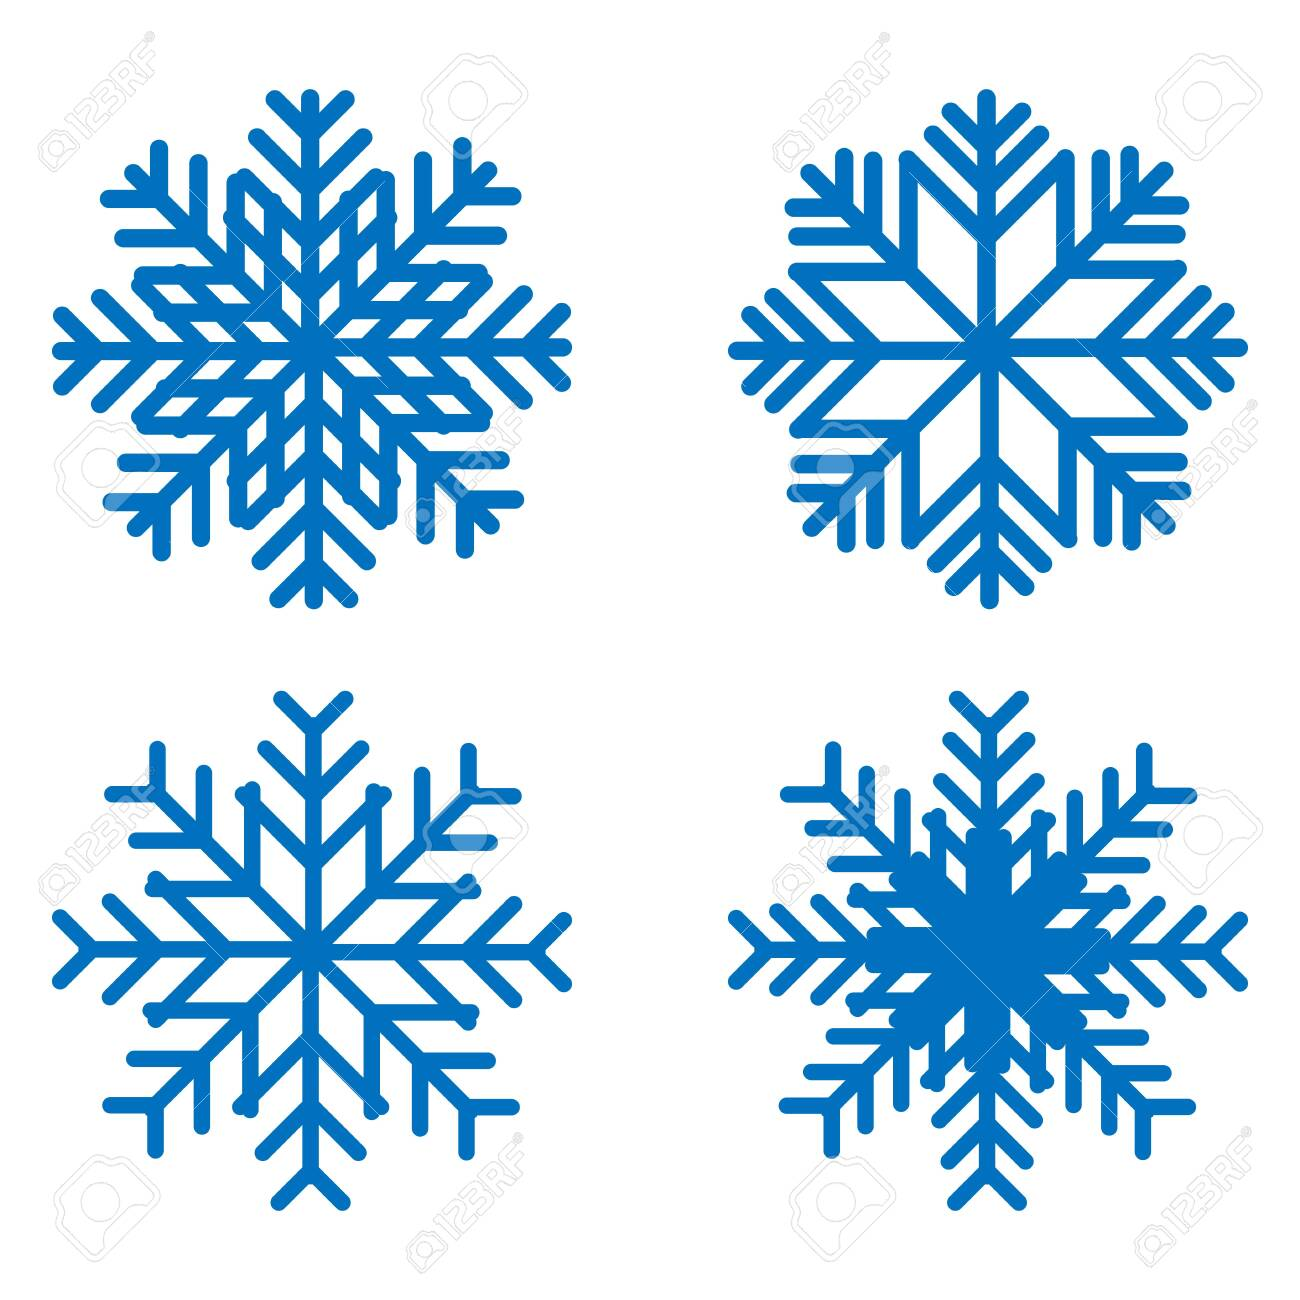 Snowflake icons kit. Set of vector snowflakes. Flat icons. - 125646702